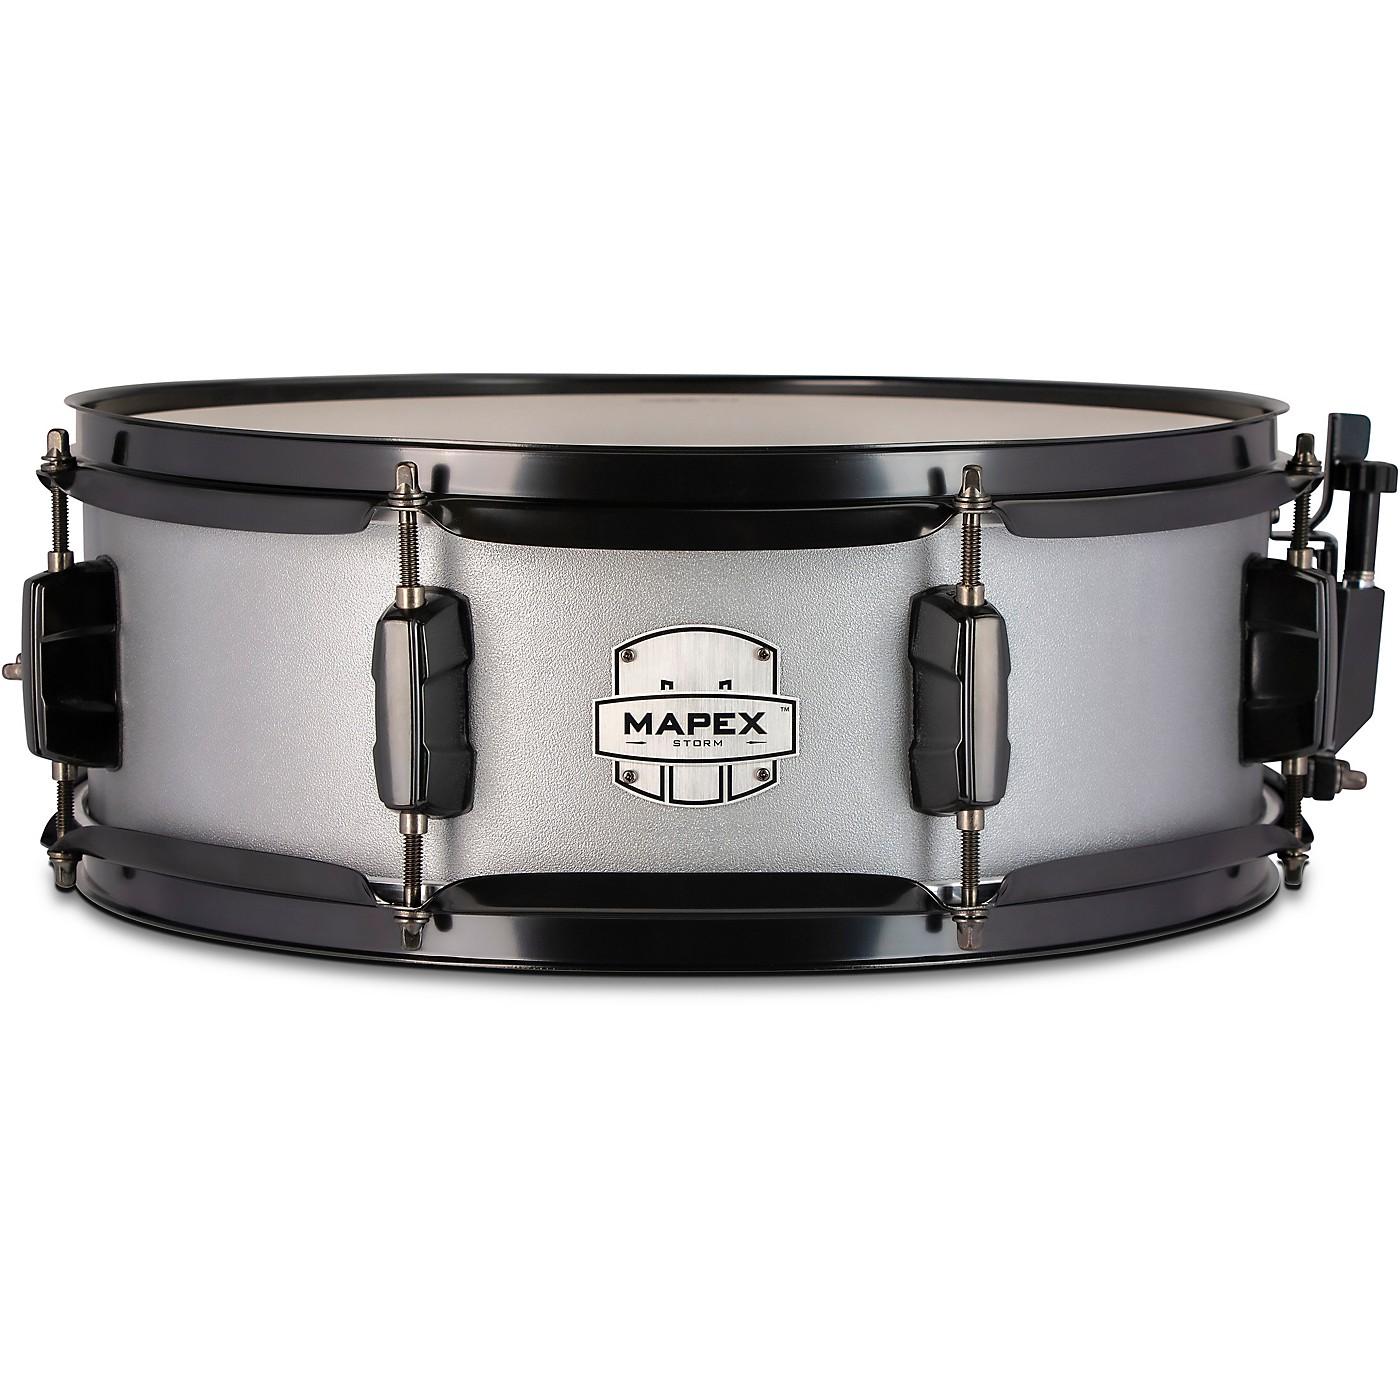 Mapex Storm Series Poplar Snare Drum 14x5.5